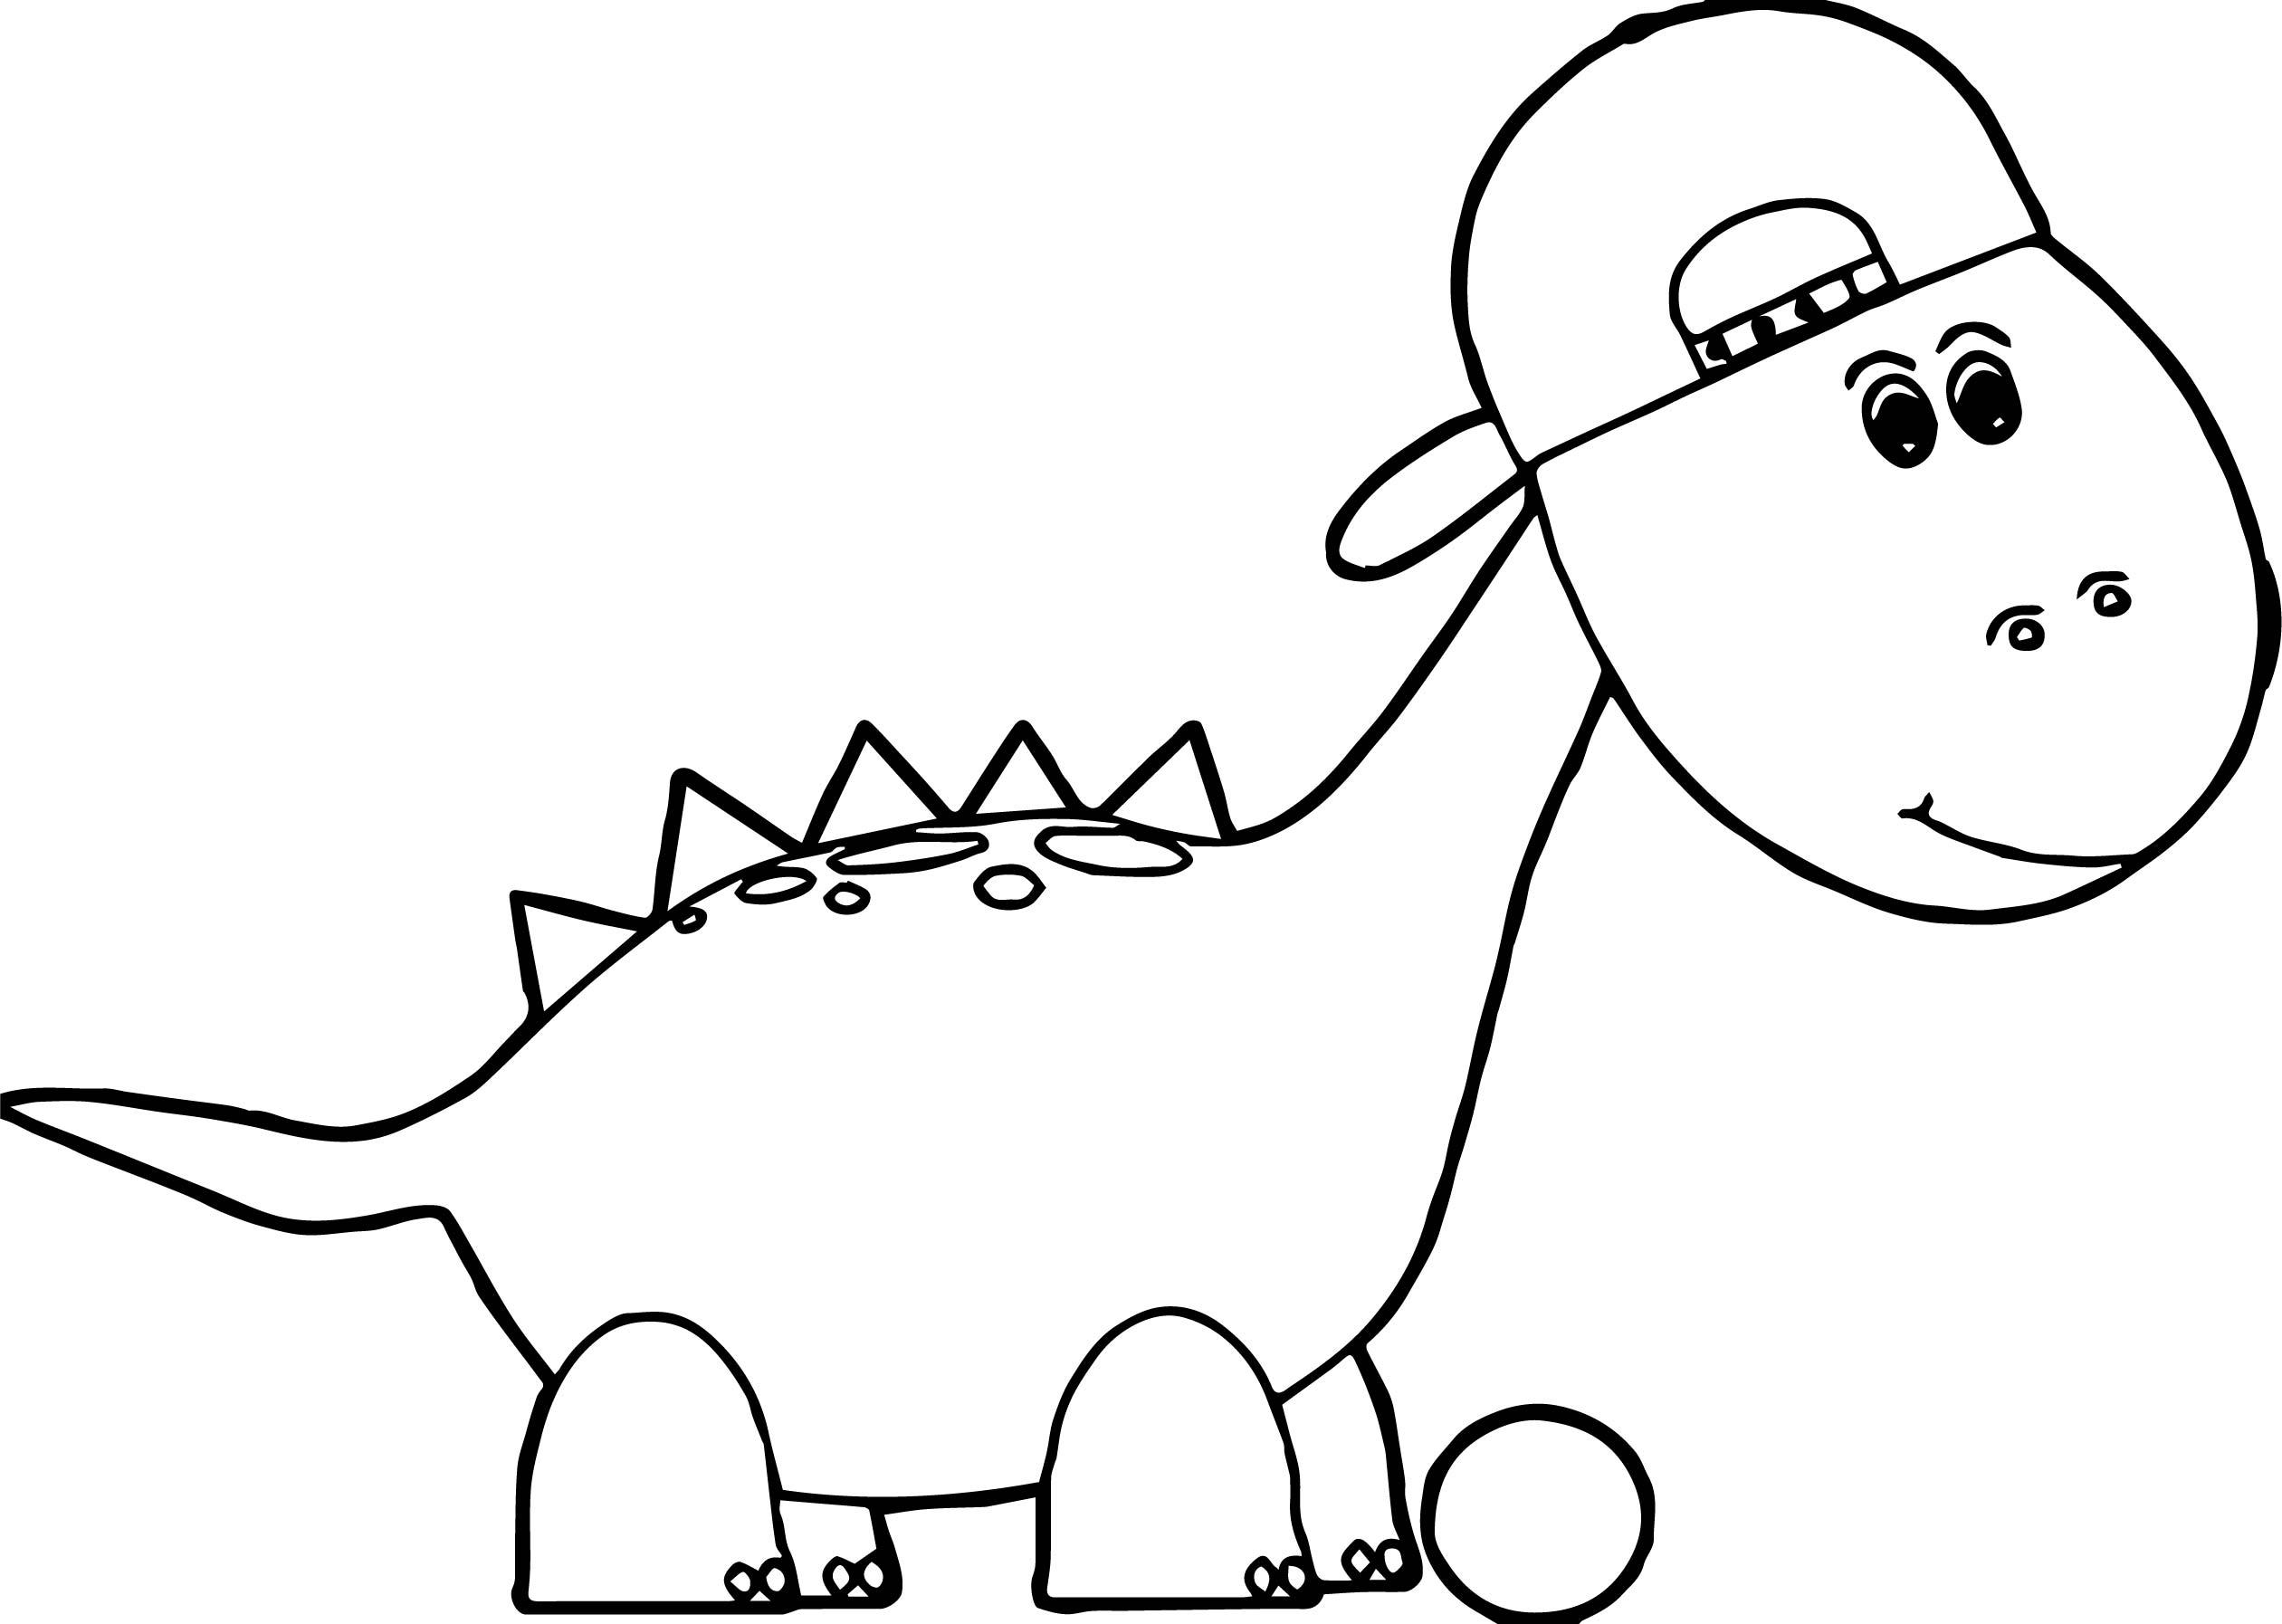 Dinosaur Egg Coloring Page | Free download best Dinosaur Egg ...